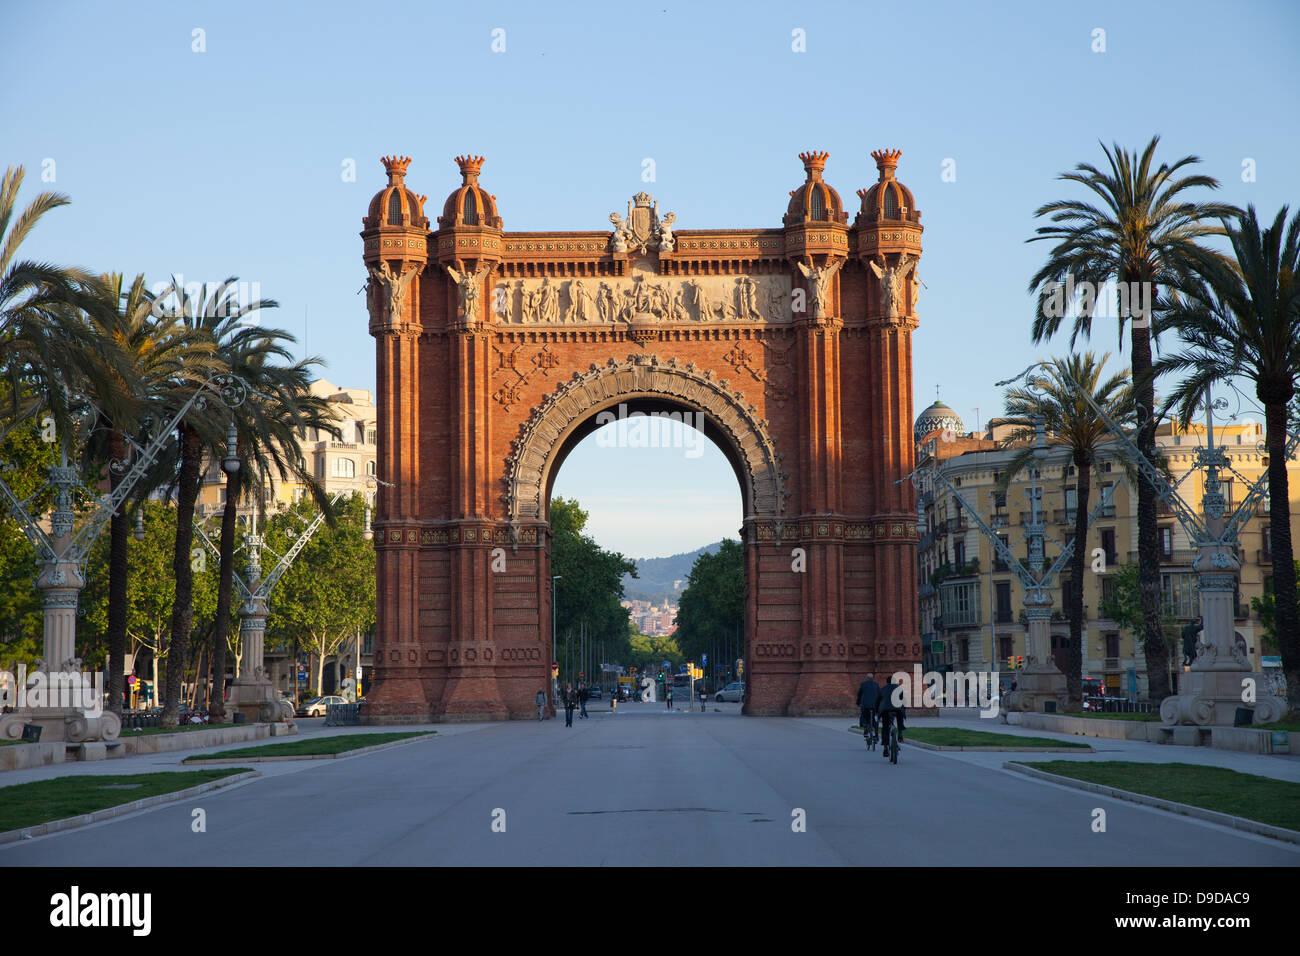 Famoso Arco del Triunfo de Barcelona (España) al amanecer. Imagen De Stock